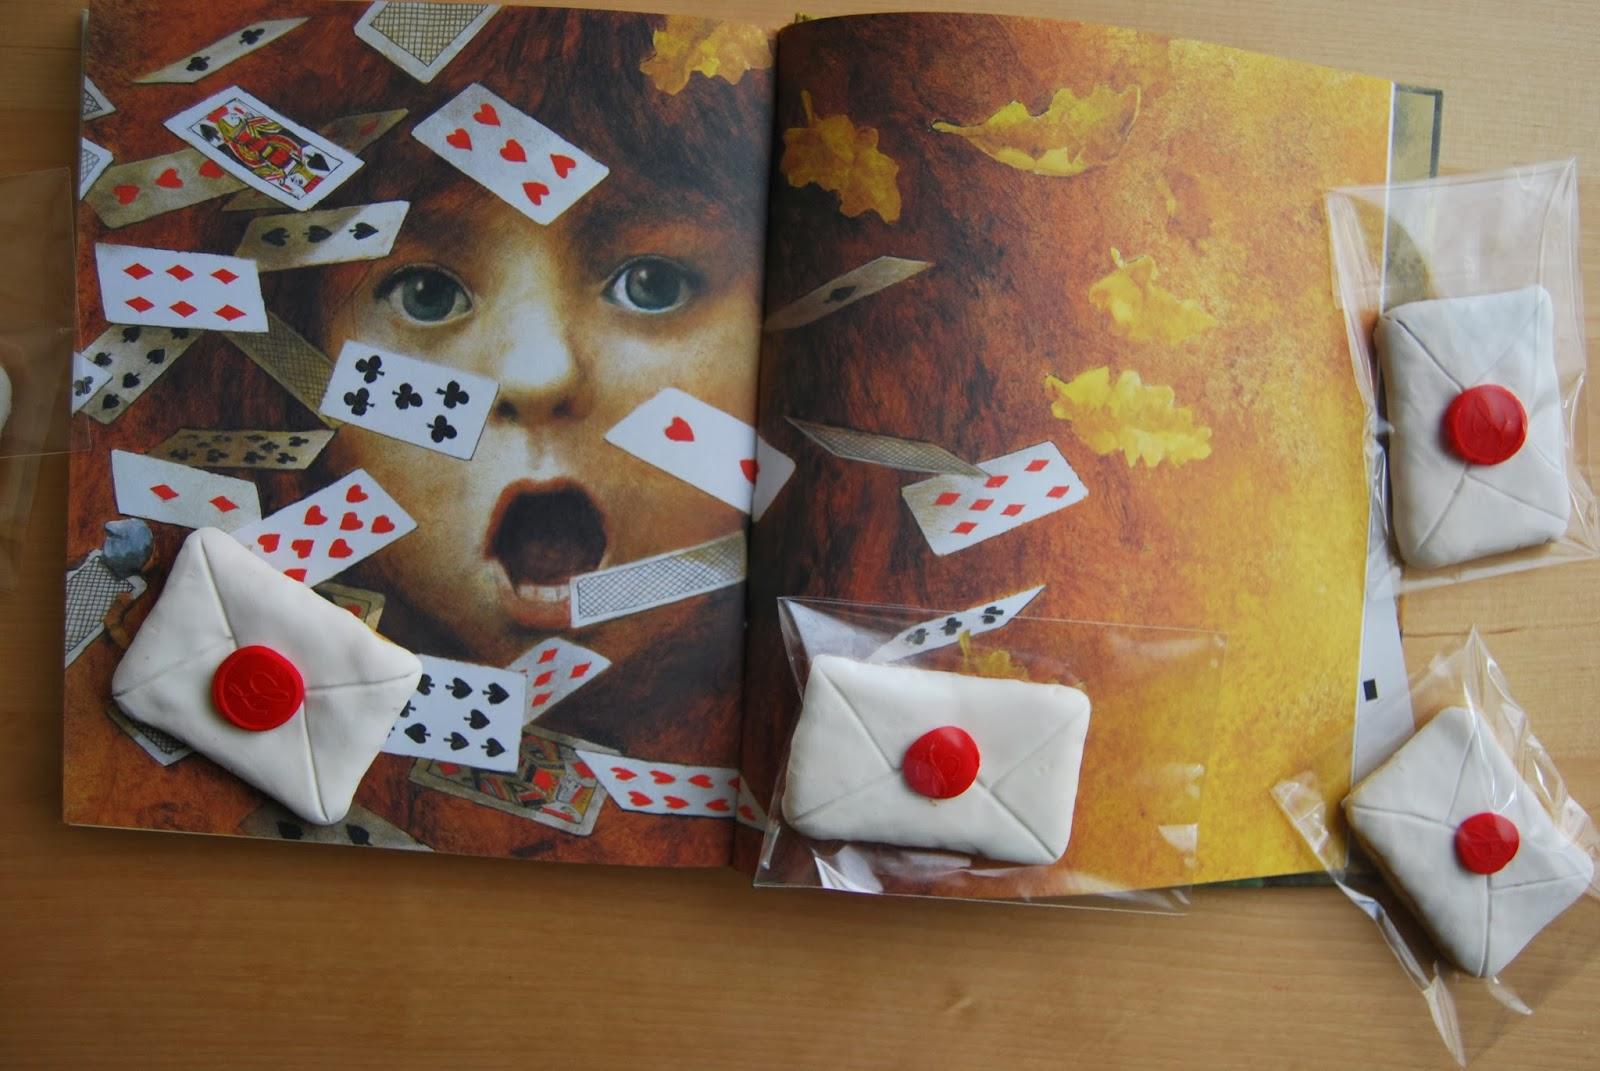 http://sosunnyblog.blogspot.com.es/2014/02/cartas-para-alicia-letters-to-wonderland.html